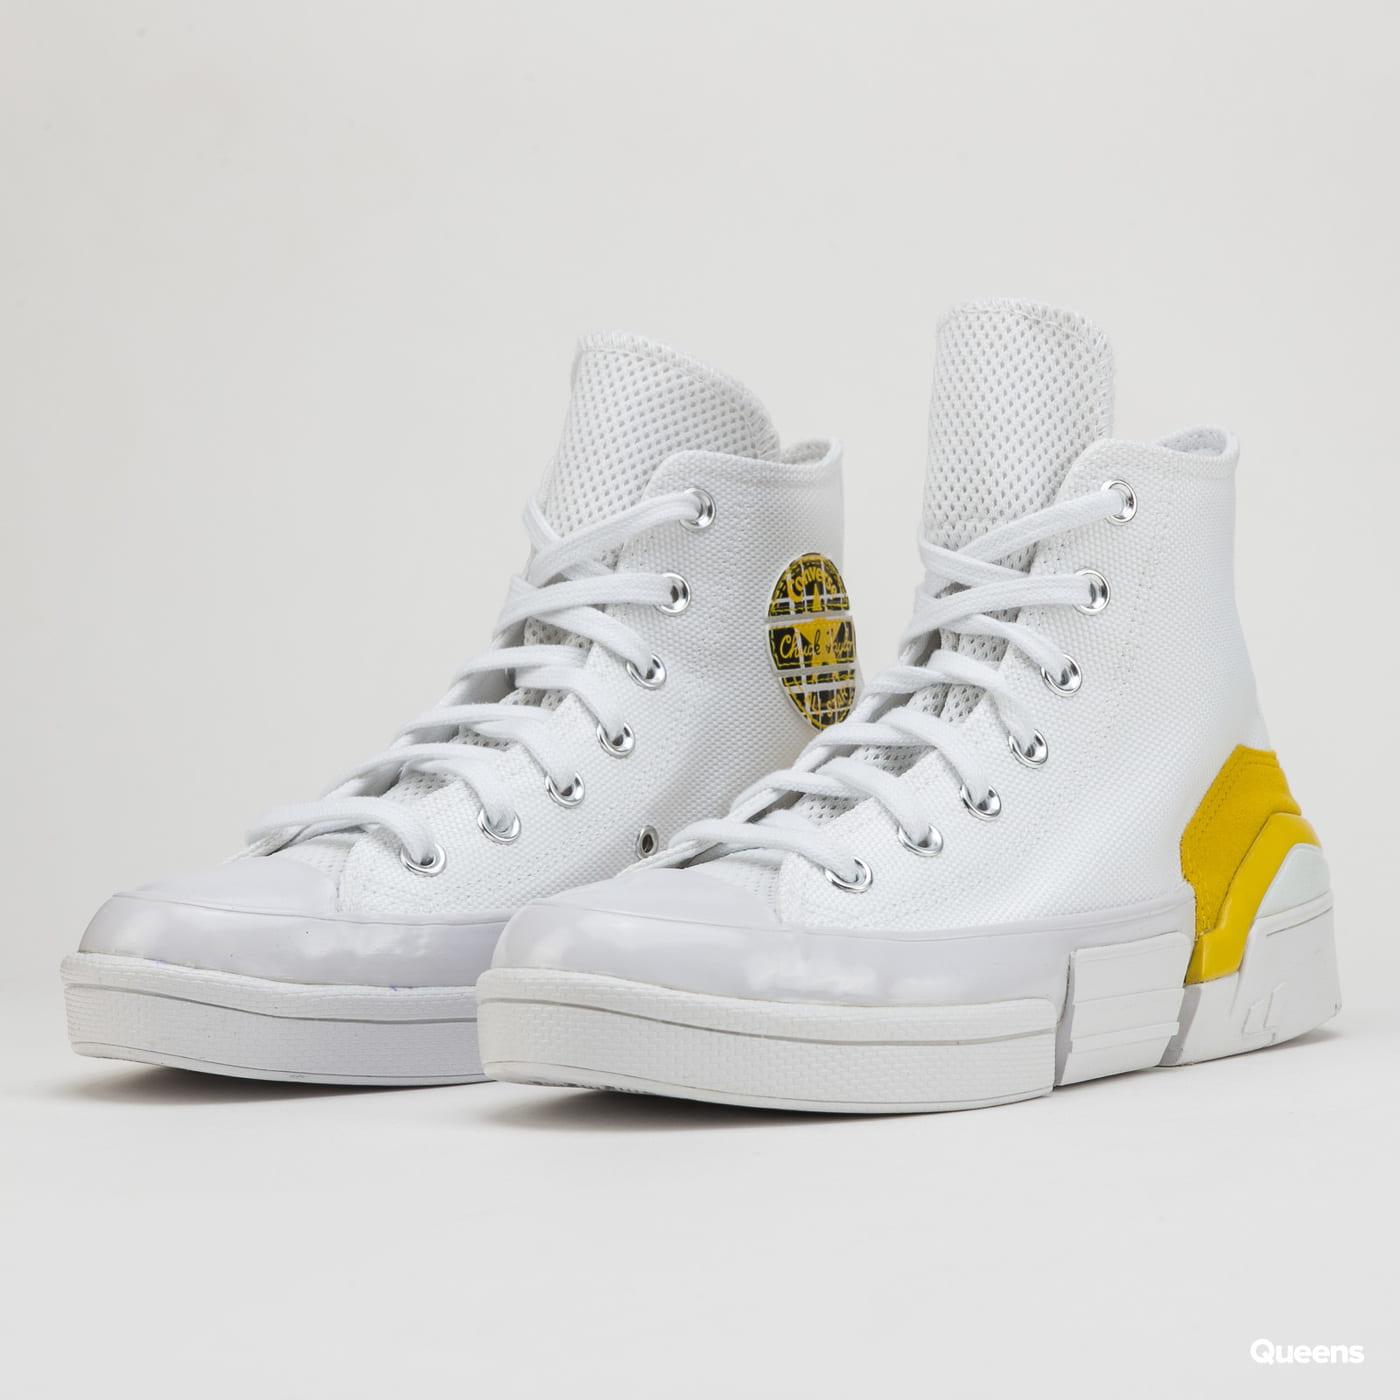 cpx70 converse